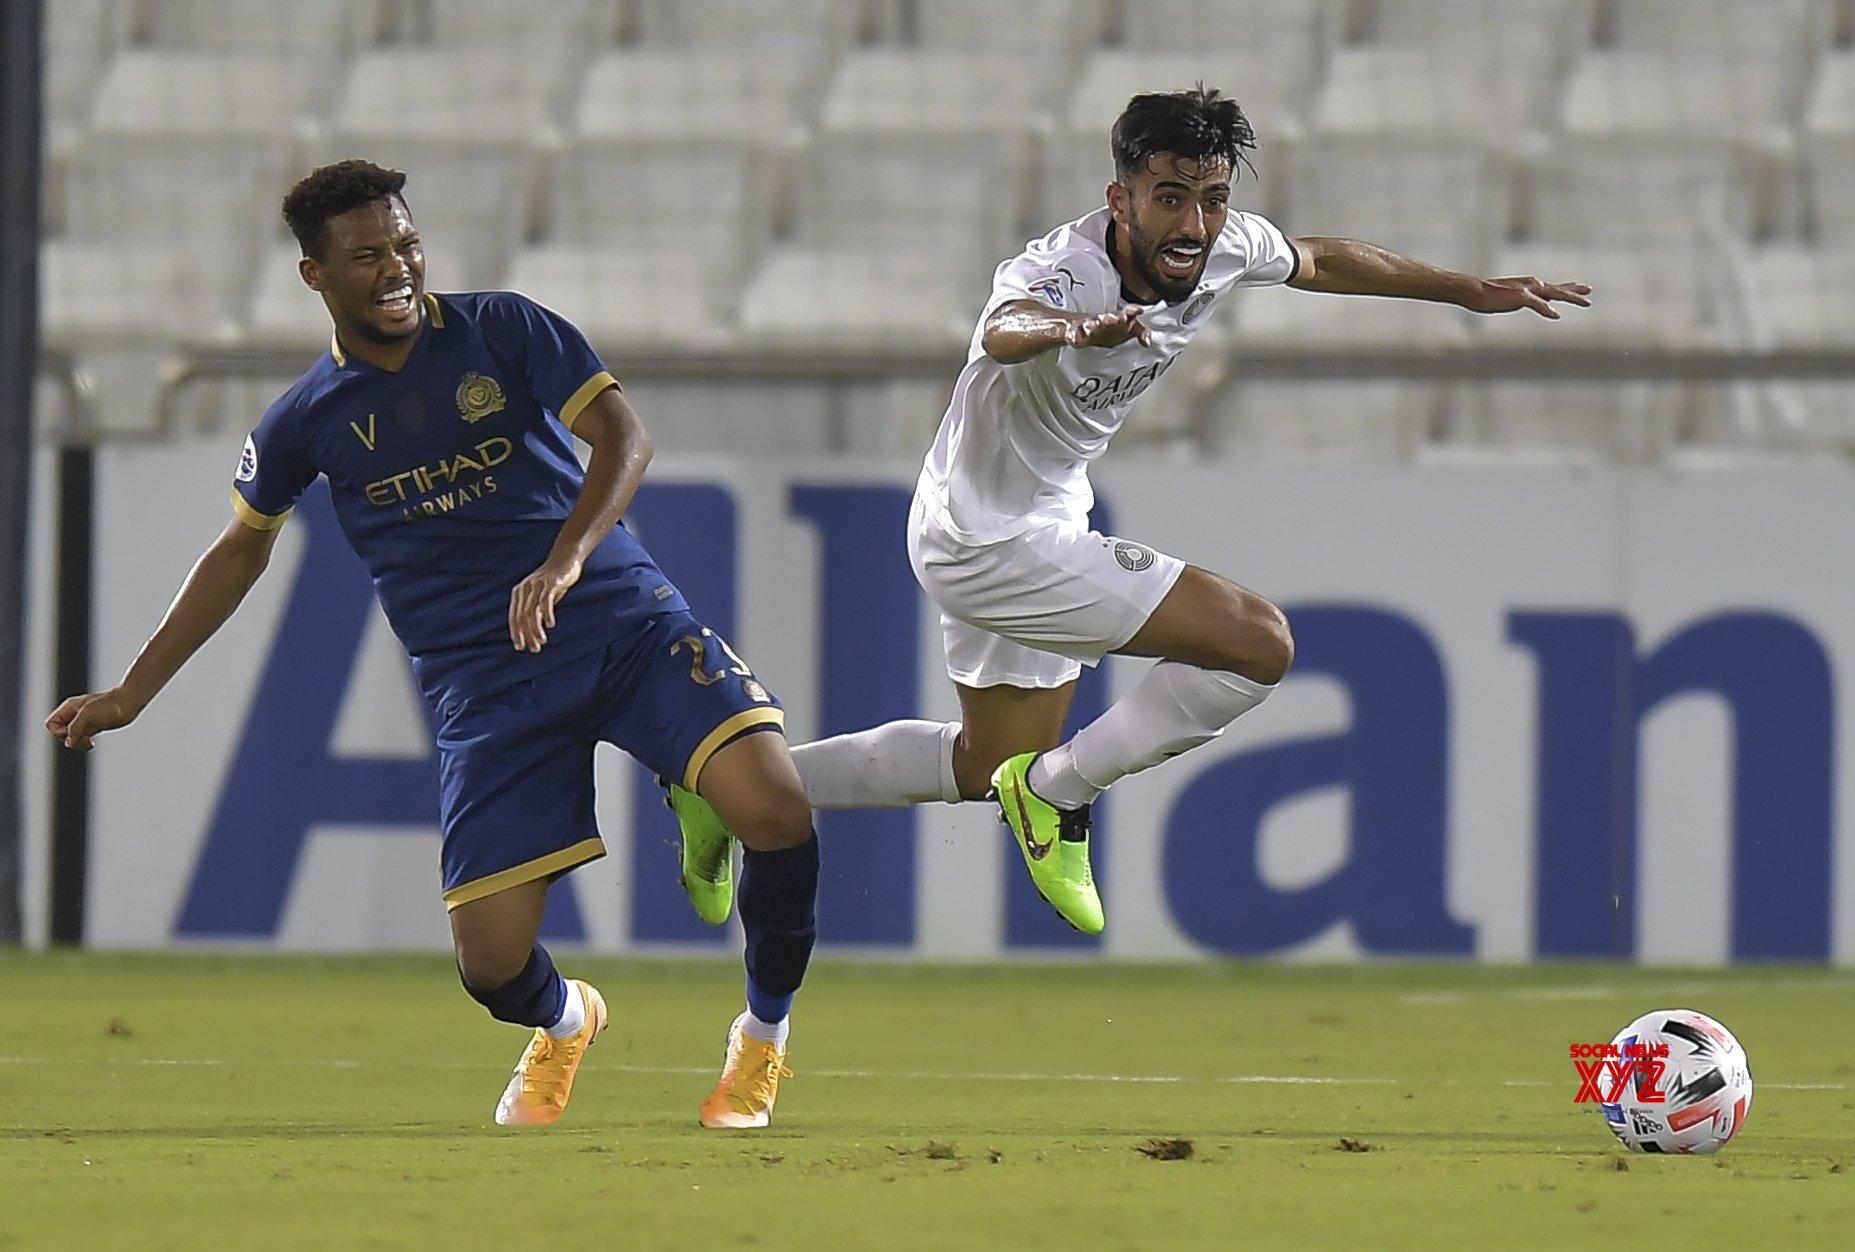 QATAR - DOHA - FOOTBALL - AFC CHAMPIONS LEAGUE - AL SADD SC VS AL NASSR #Gallery